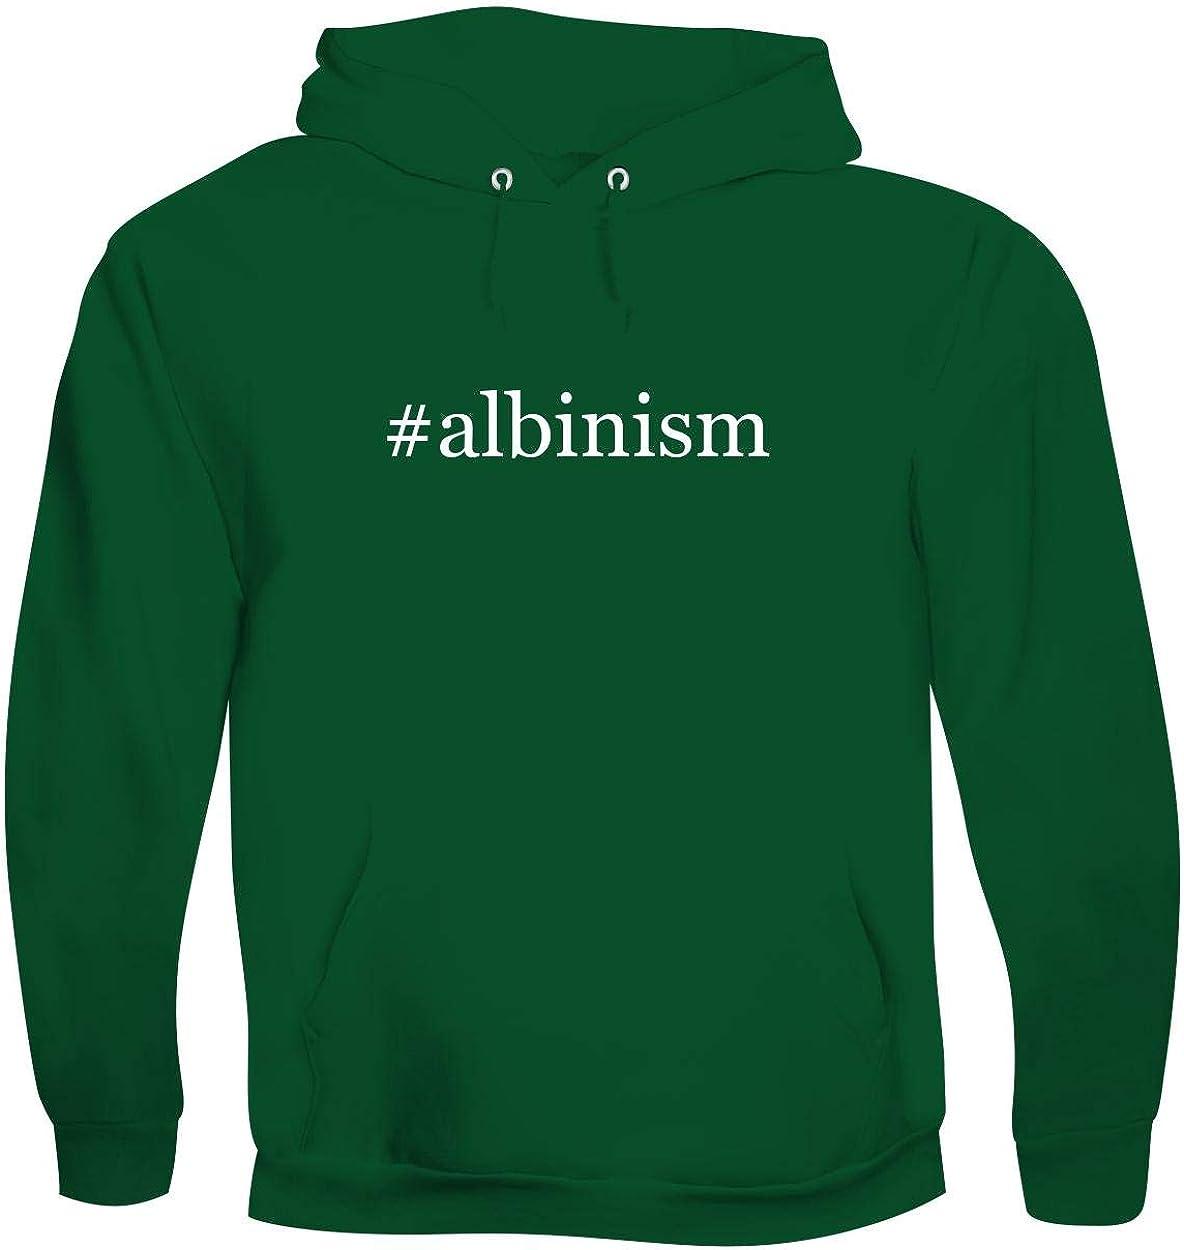 #Albinism - Men'S Hashtag Soft & Comfortable Hoodie Sweatshirt Pullover